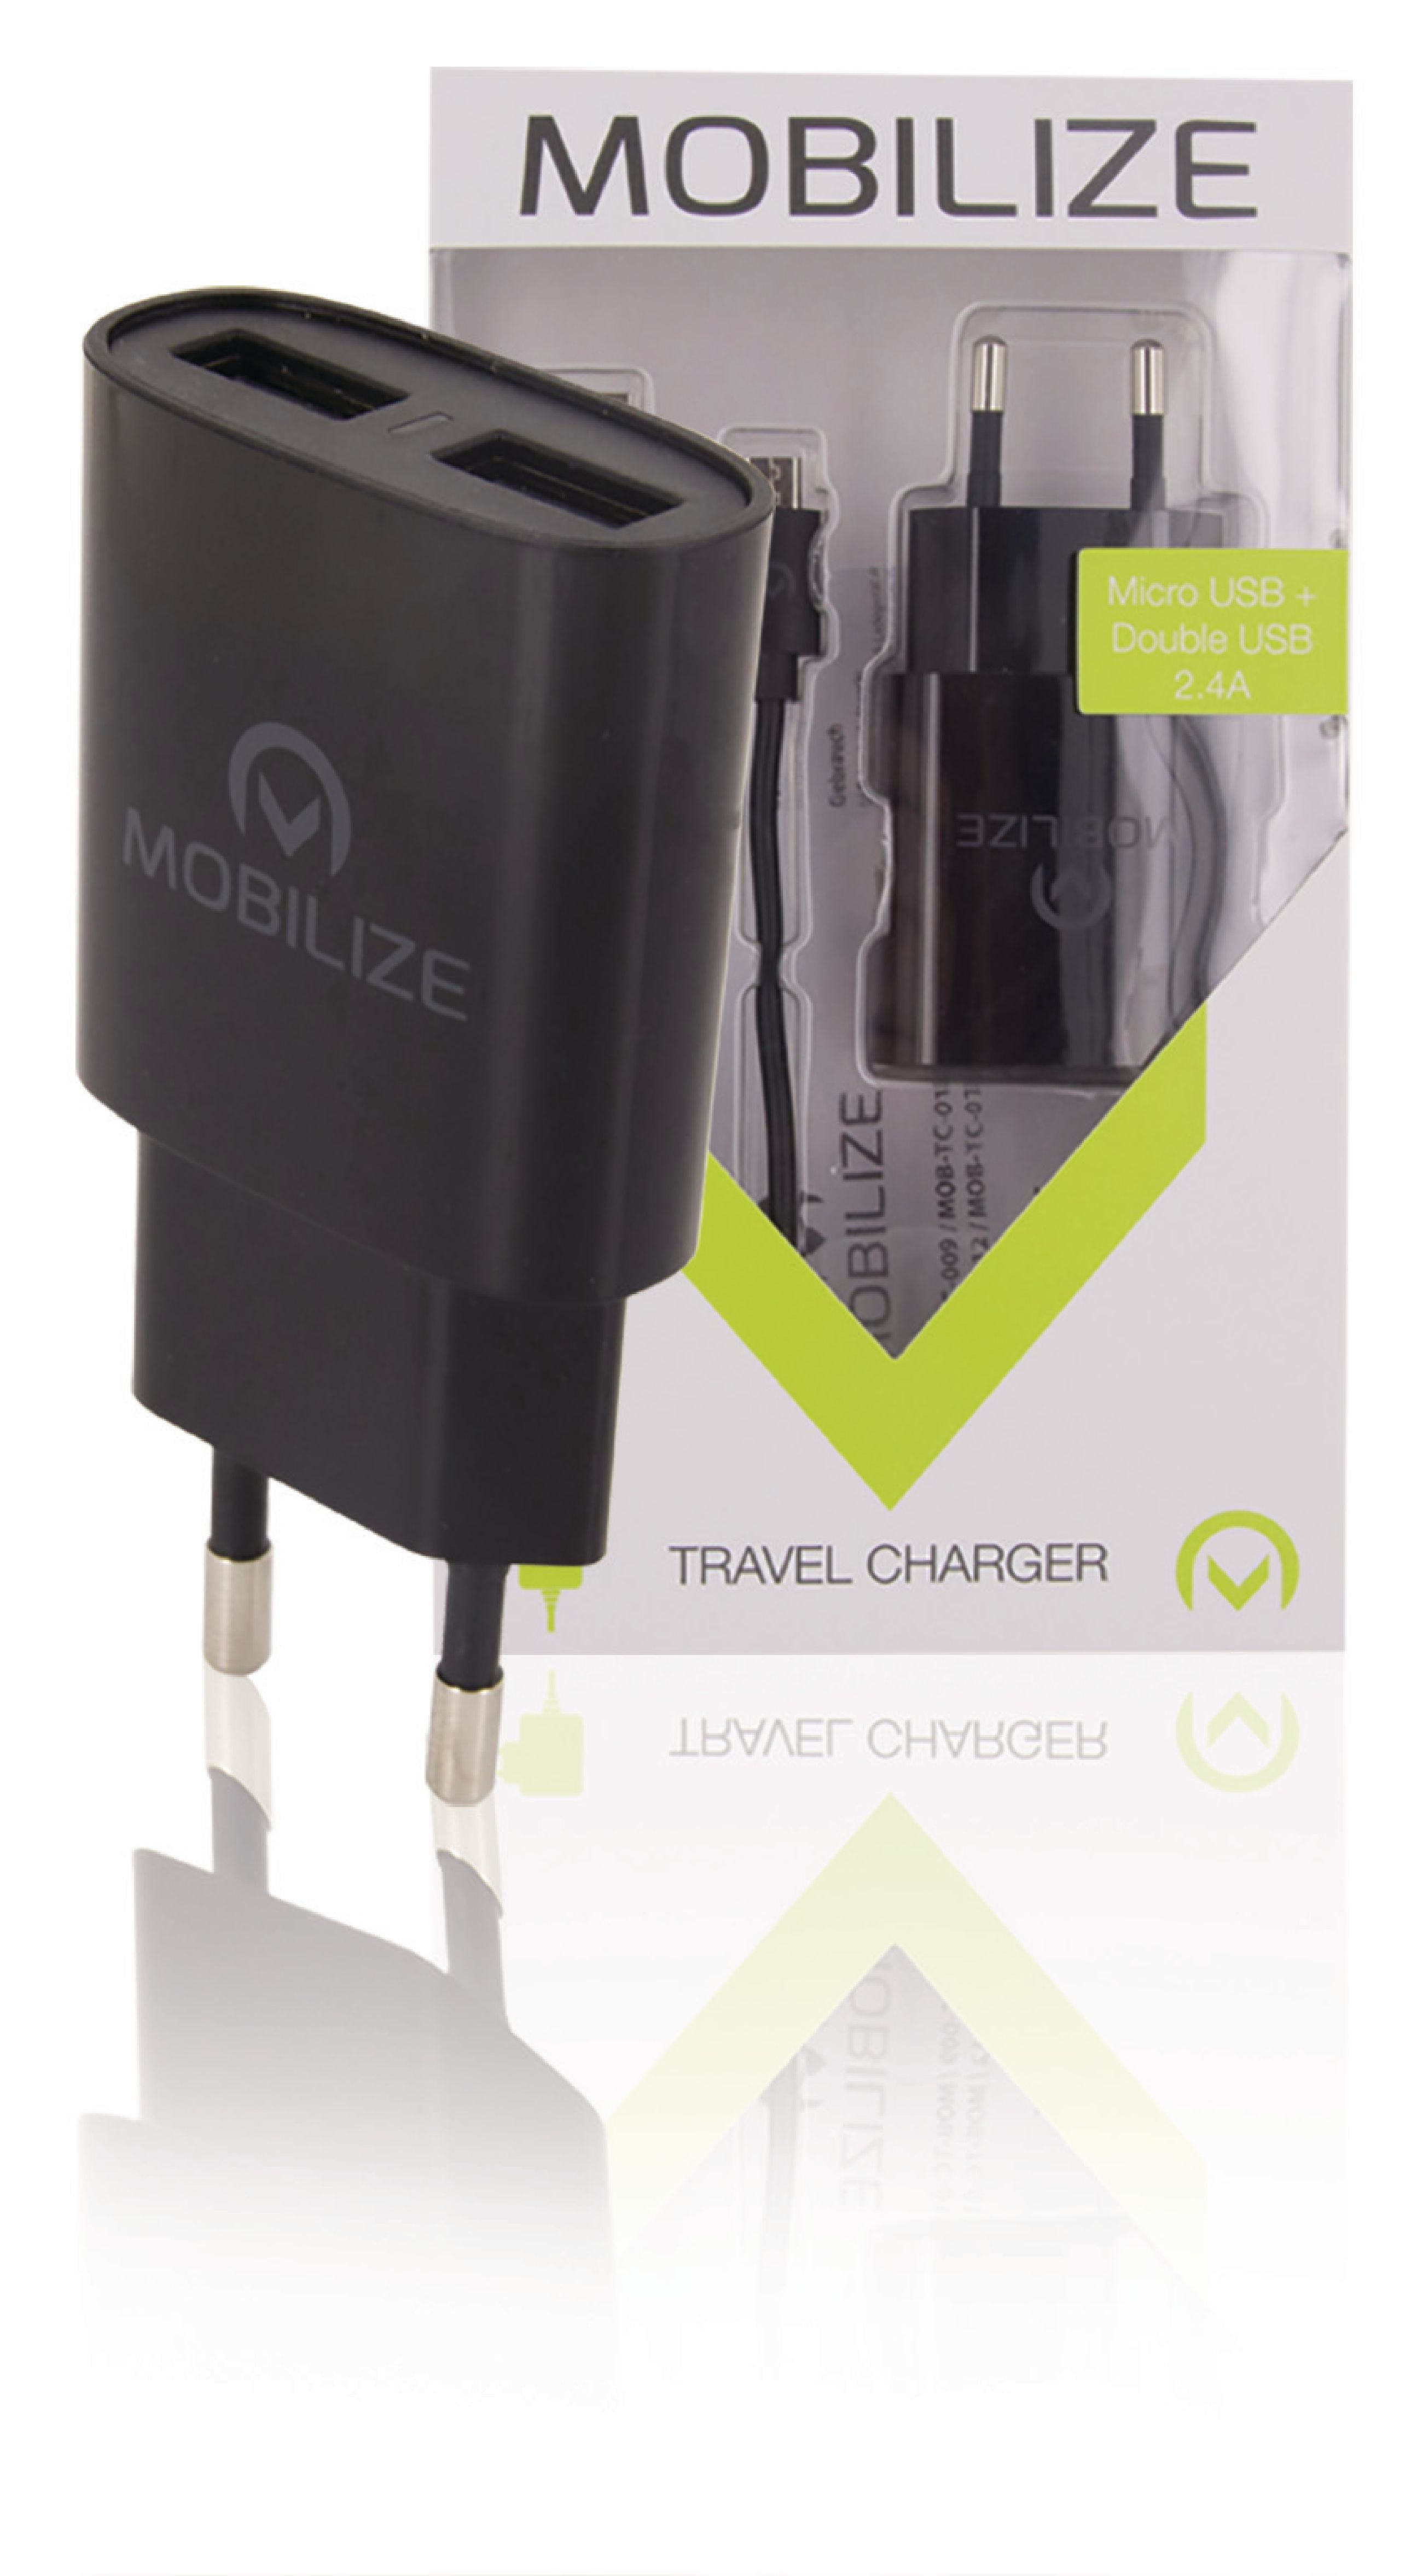 Billede af Universal Ac Power Adapter USB / Micro USB Sort